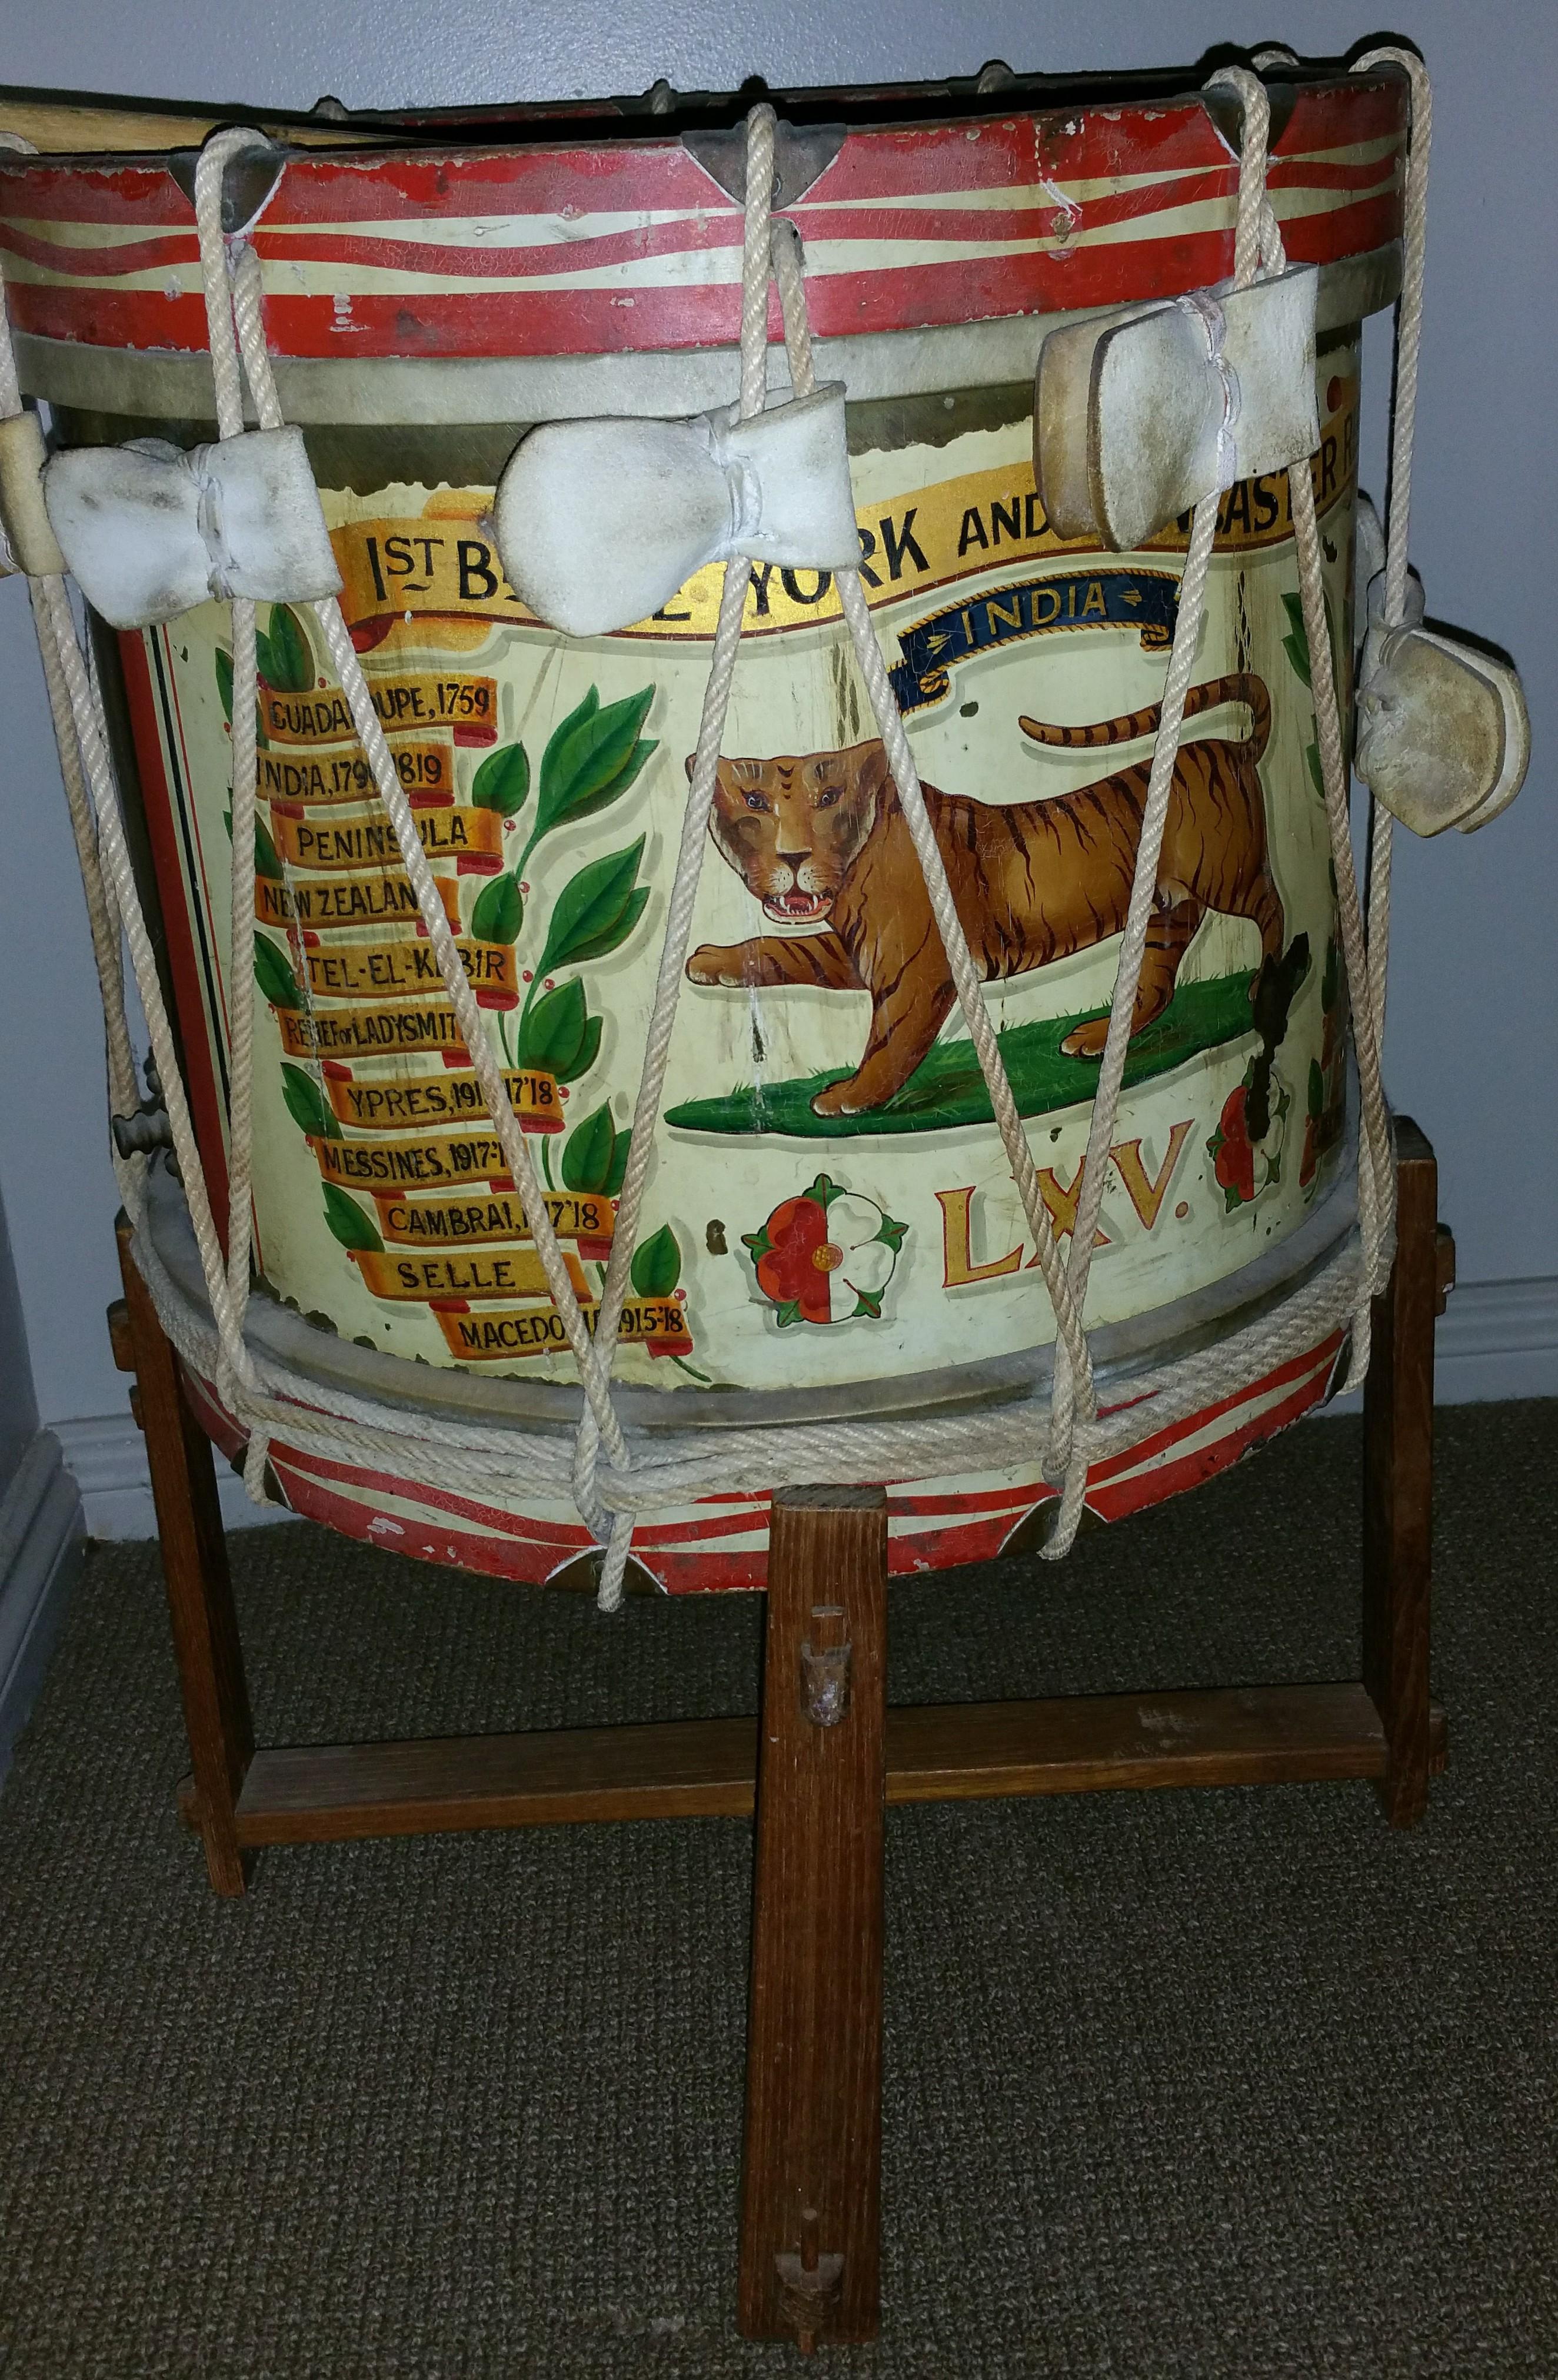 York and Lancs drum